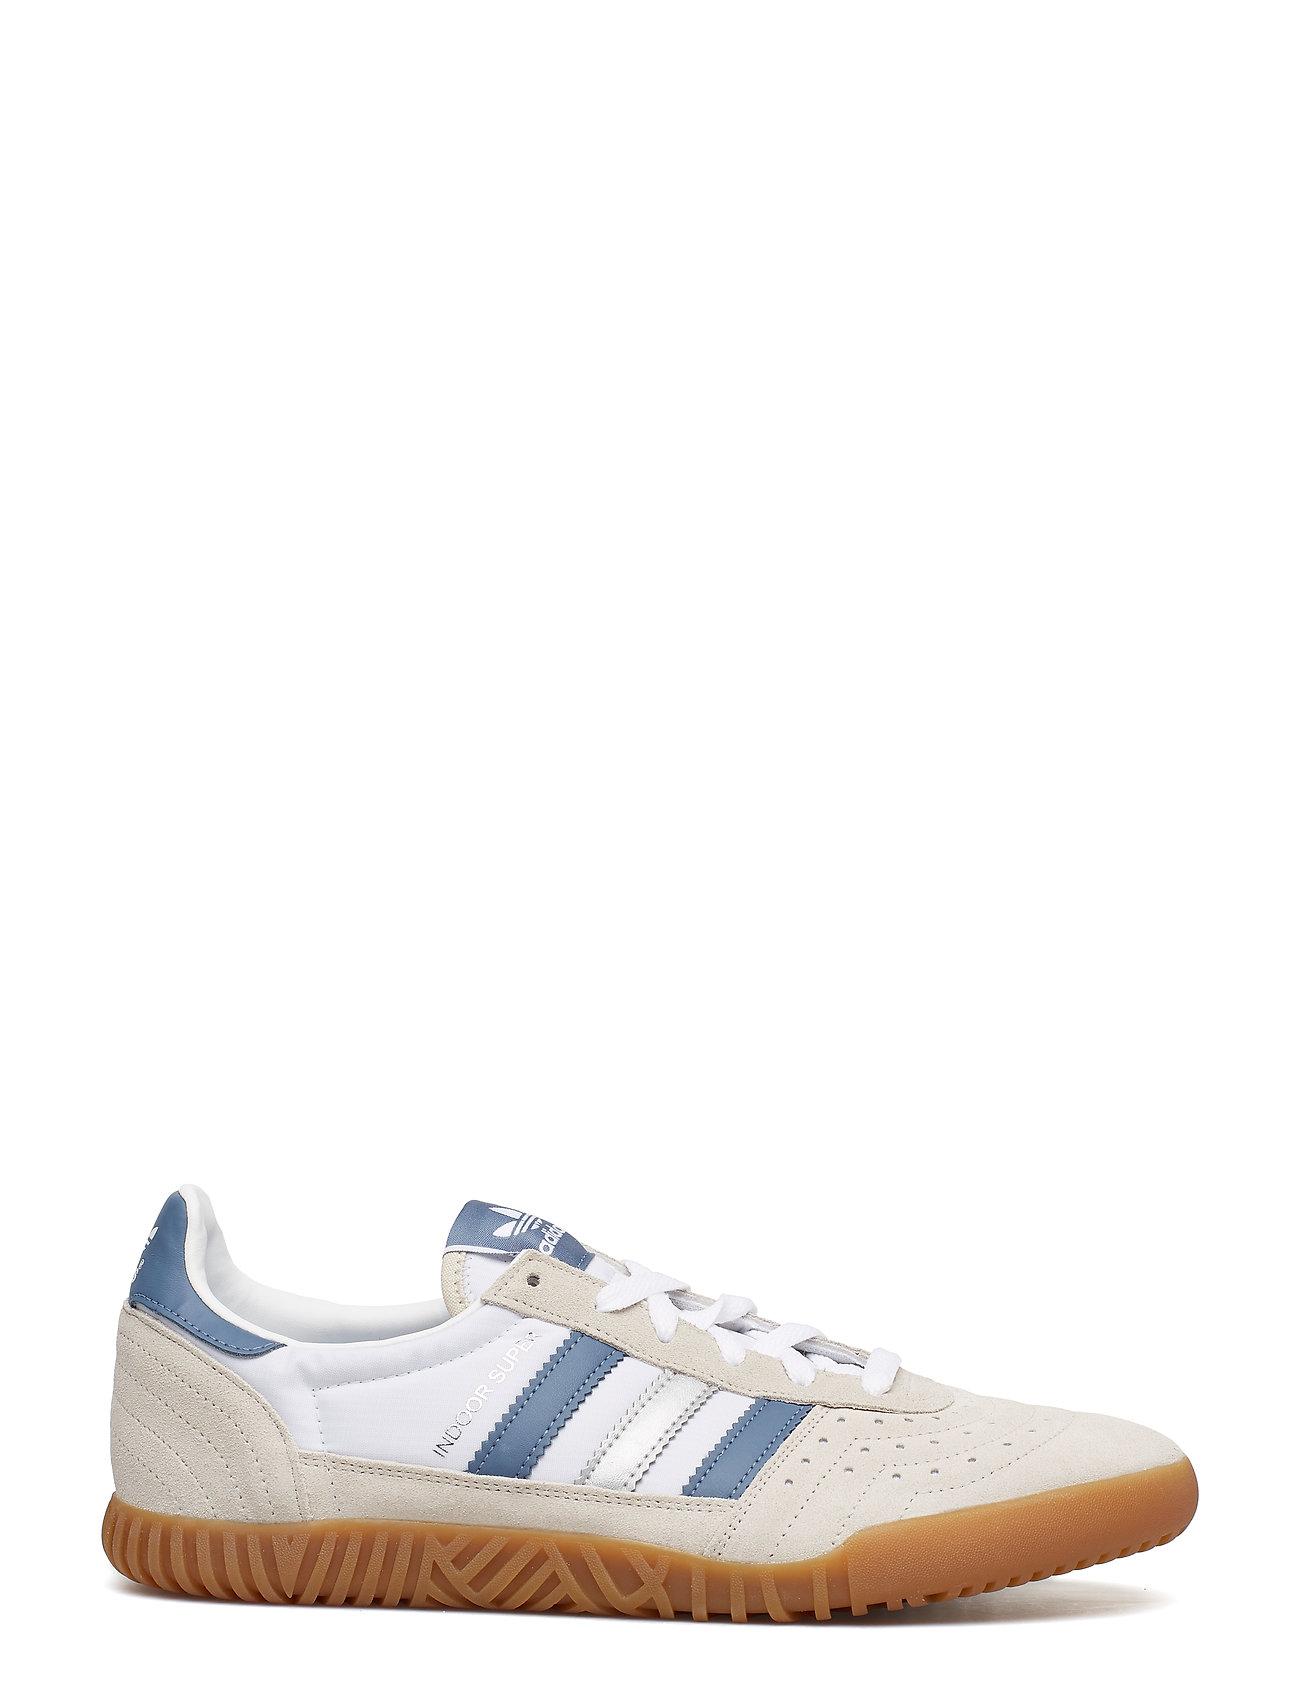 Købe Adidas Originals Indoor Super Herre Hvid,Adidas